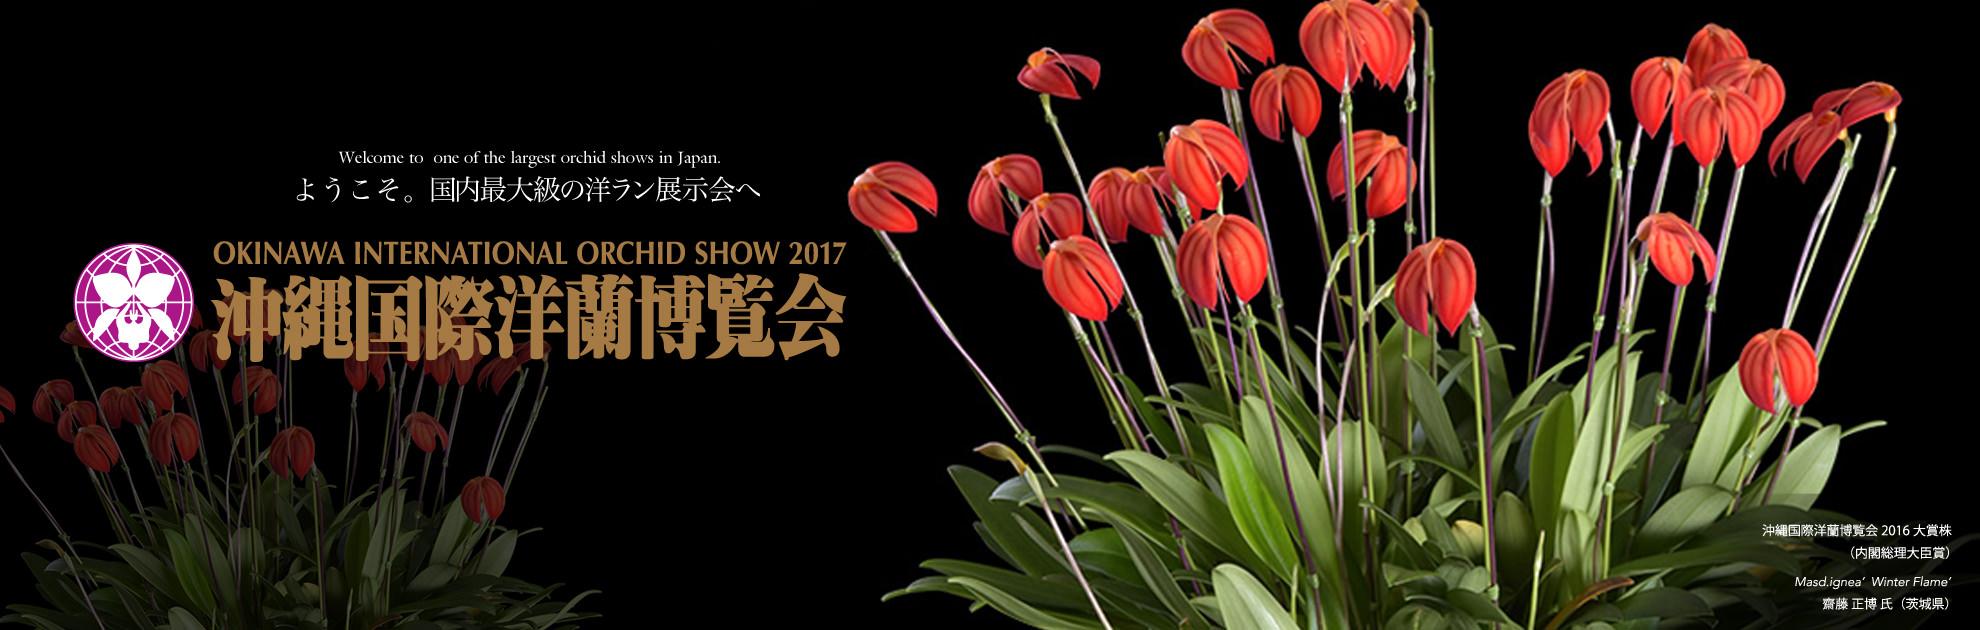 Big event of international scale that approximately 20,000 points of orchids are displayed! okinawakokusaiyoranhaku*kai 2017